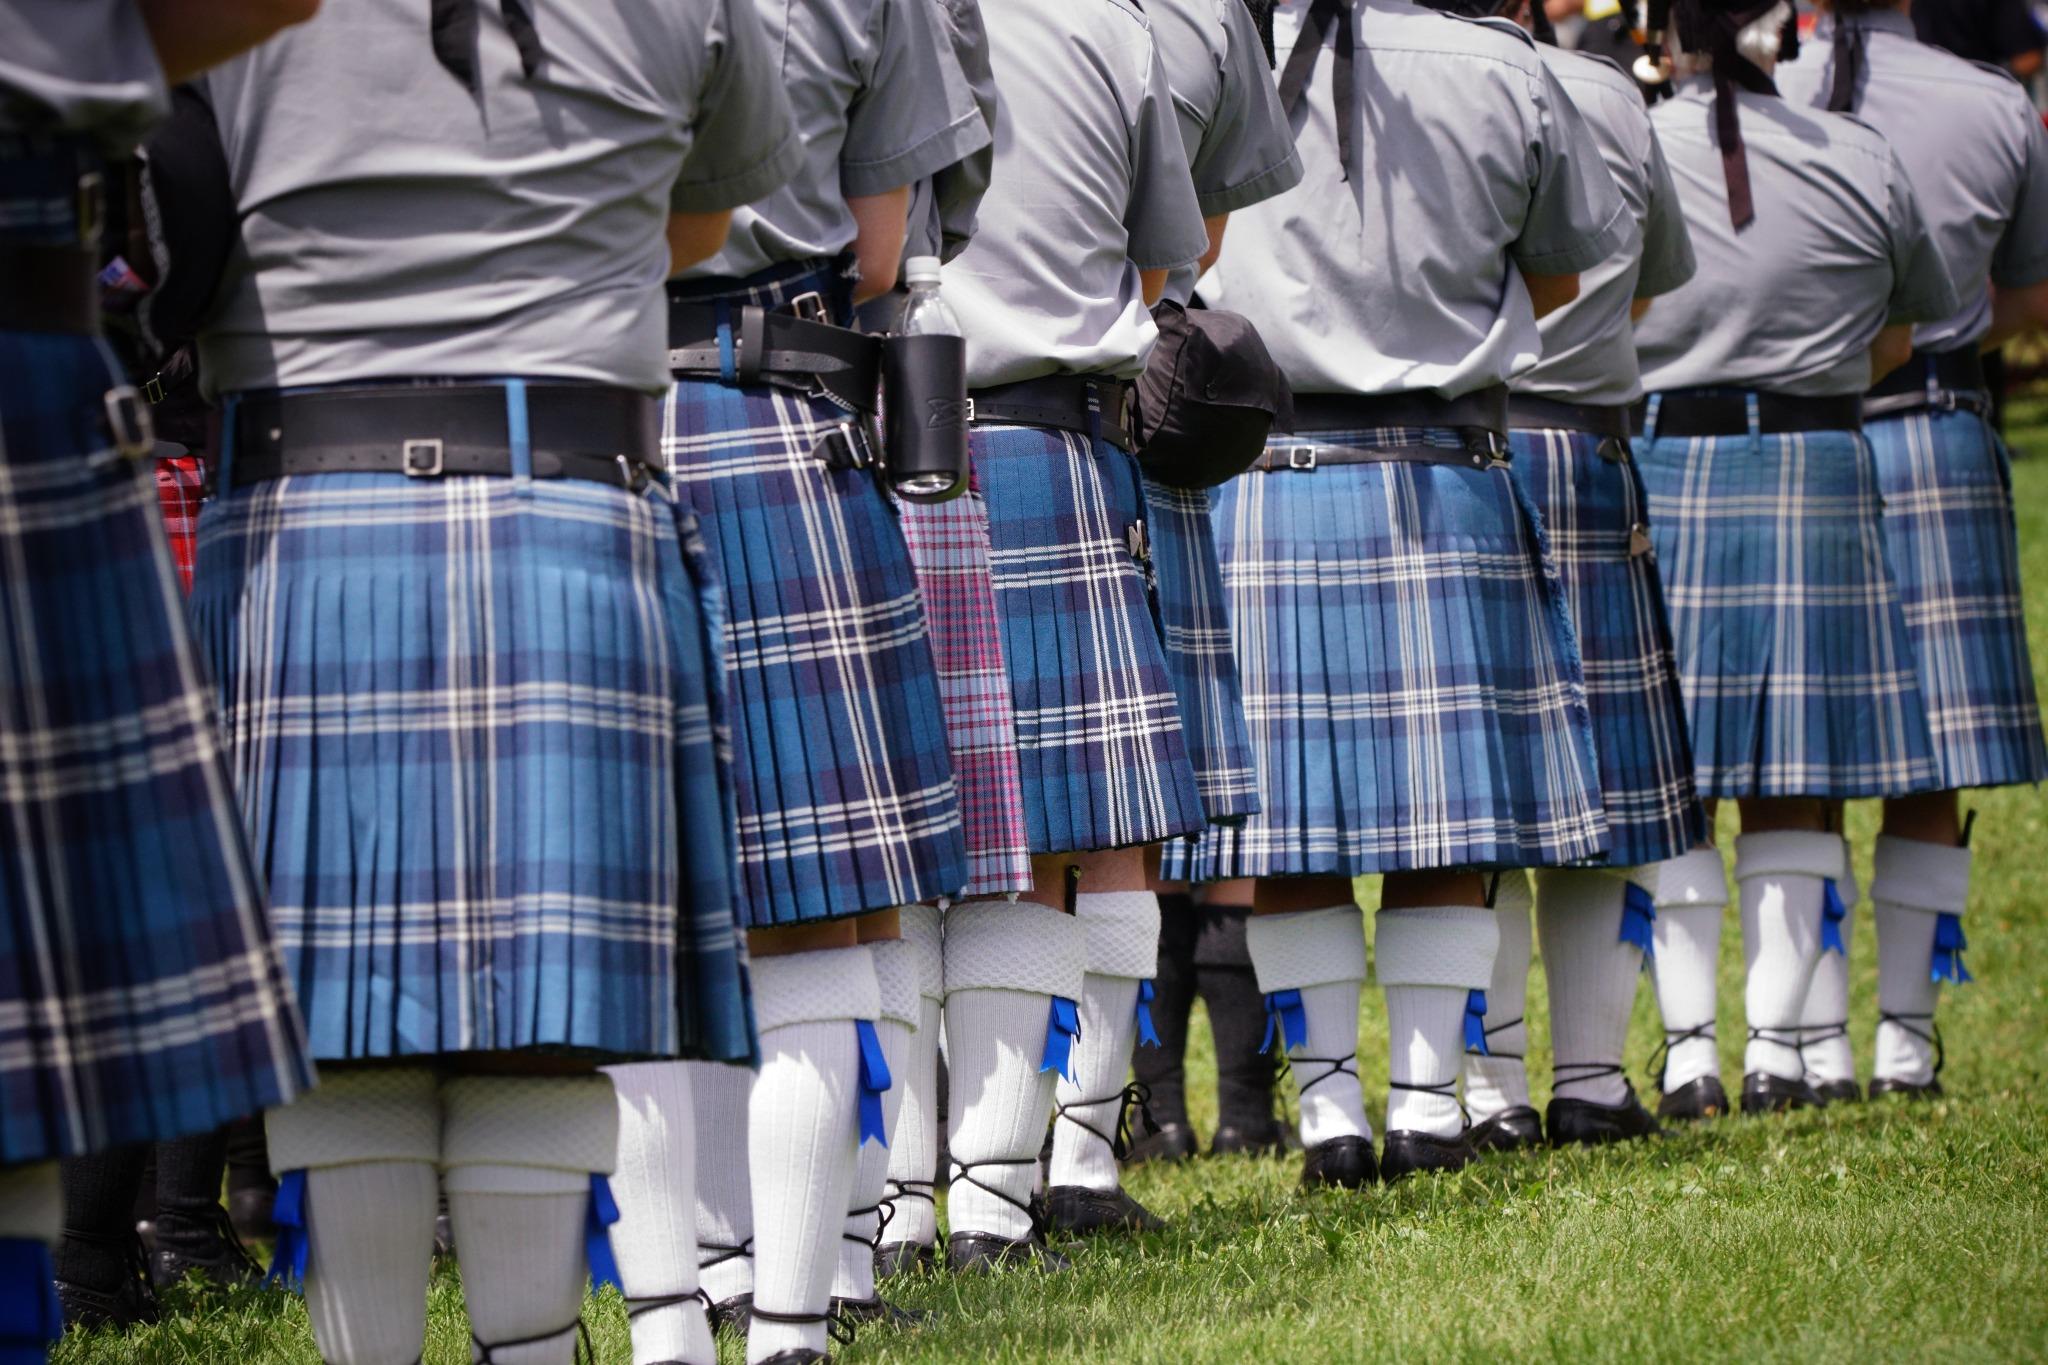 Men standing in a line wearing matching clan tartan kilts